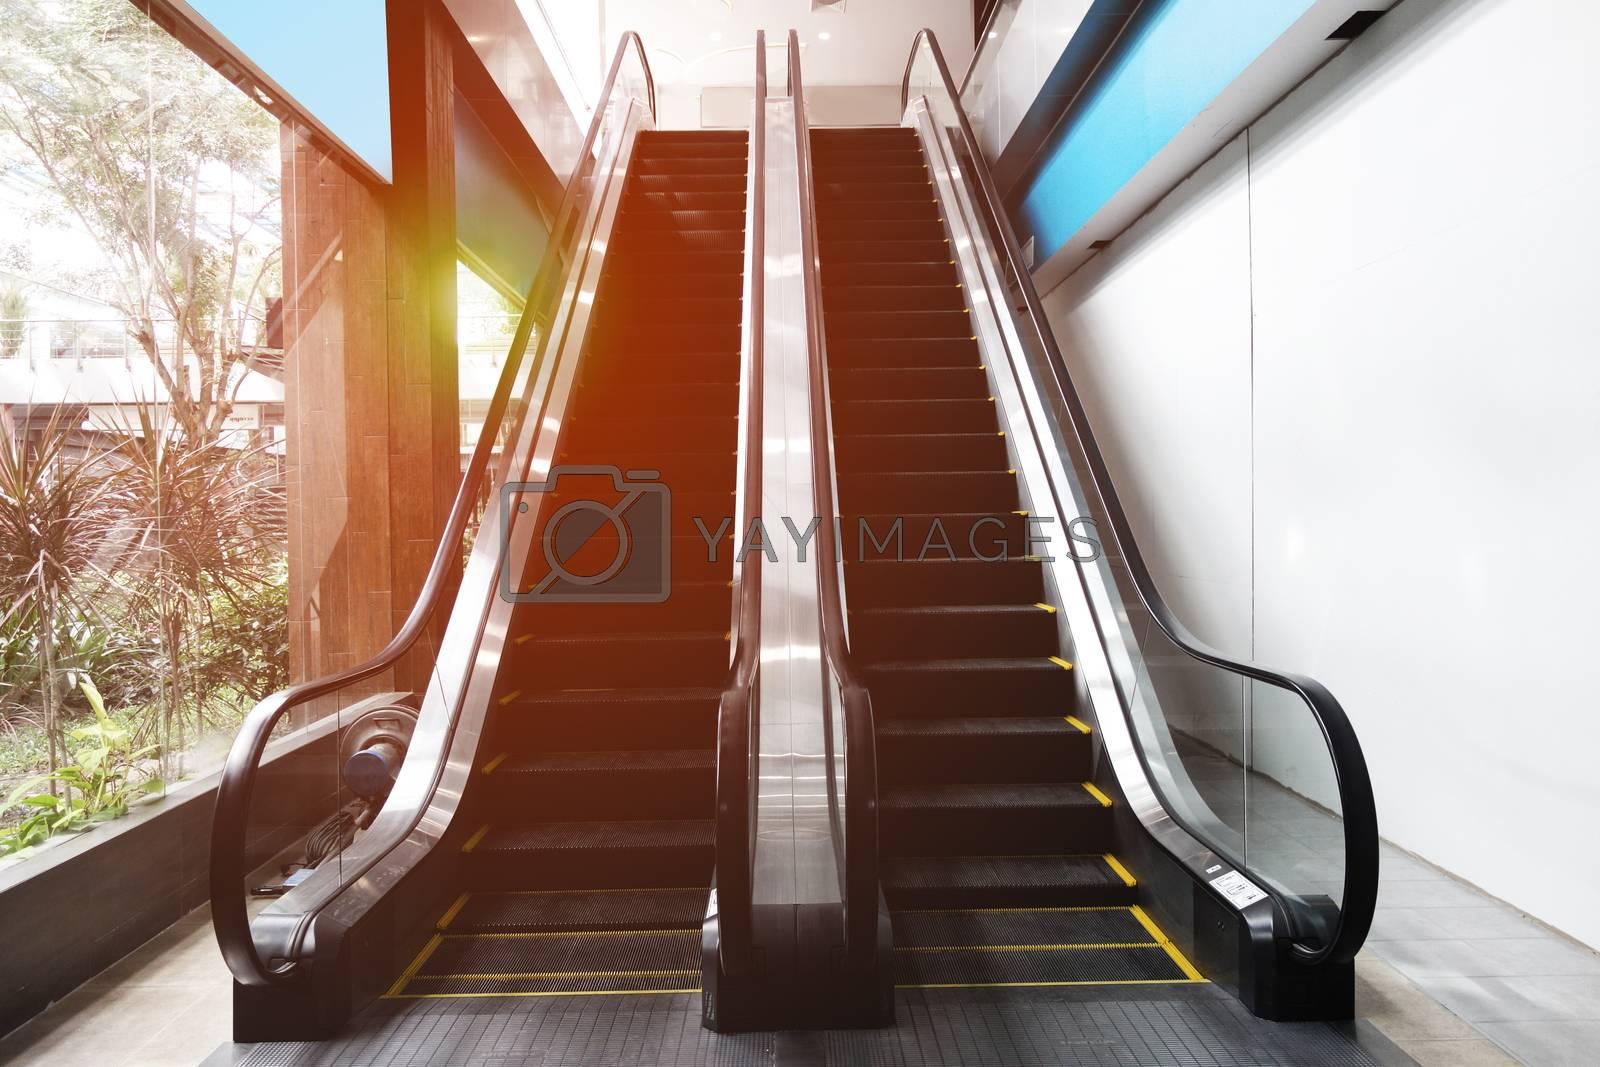 escalator in the indoor, urban landscape by Kingsman911